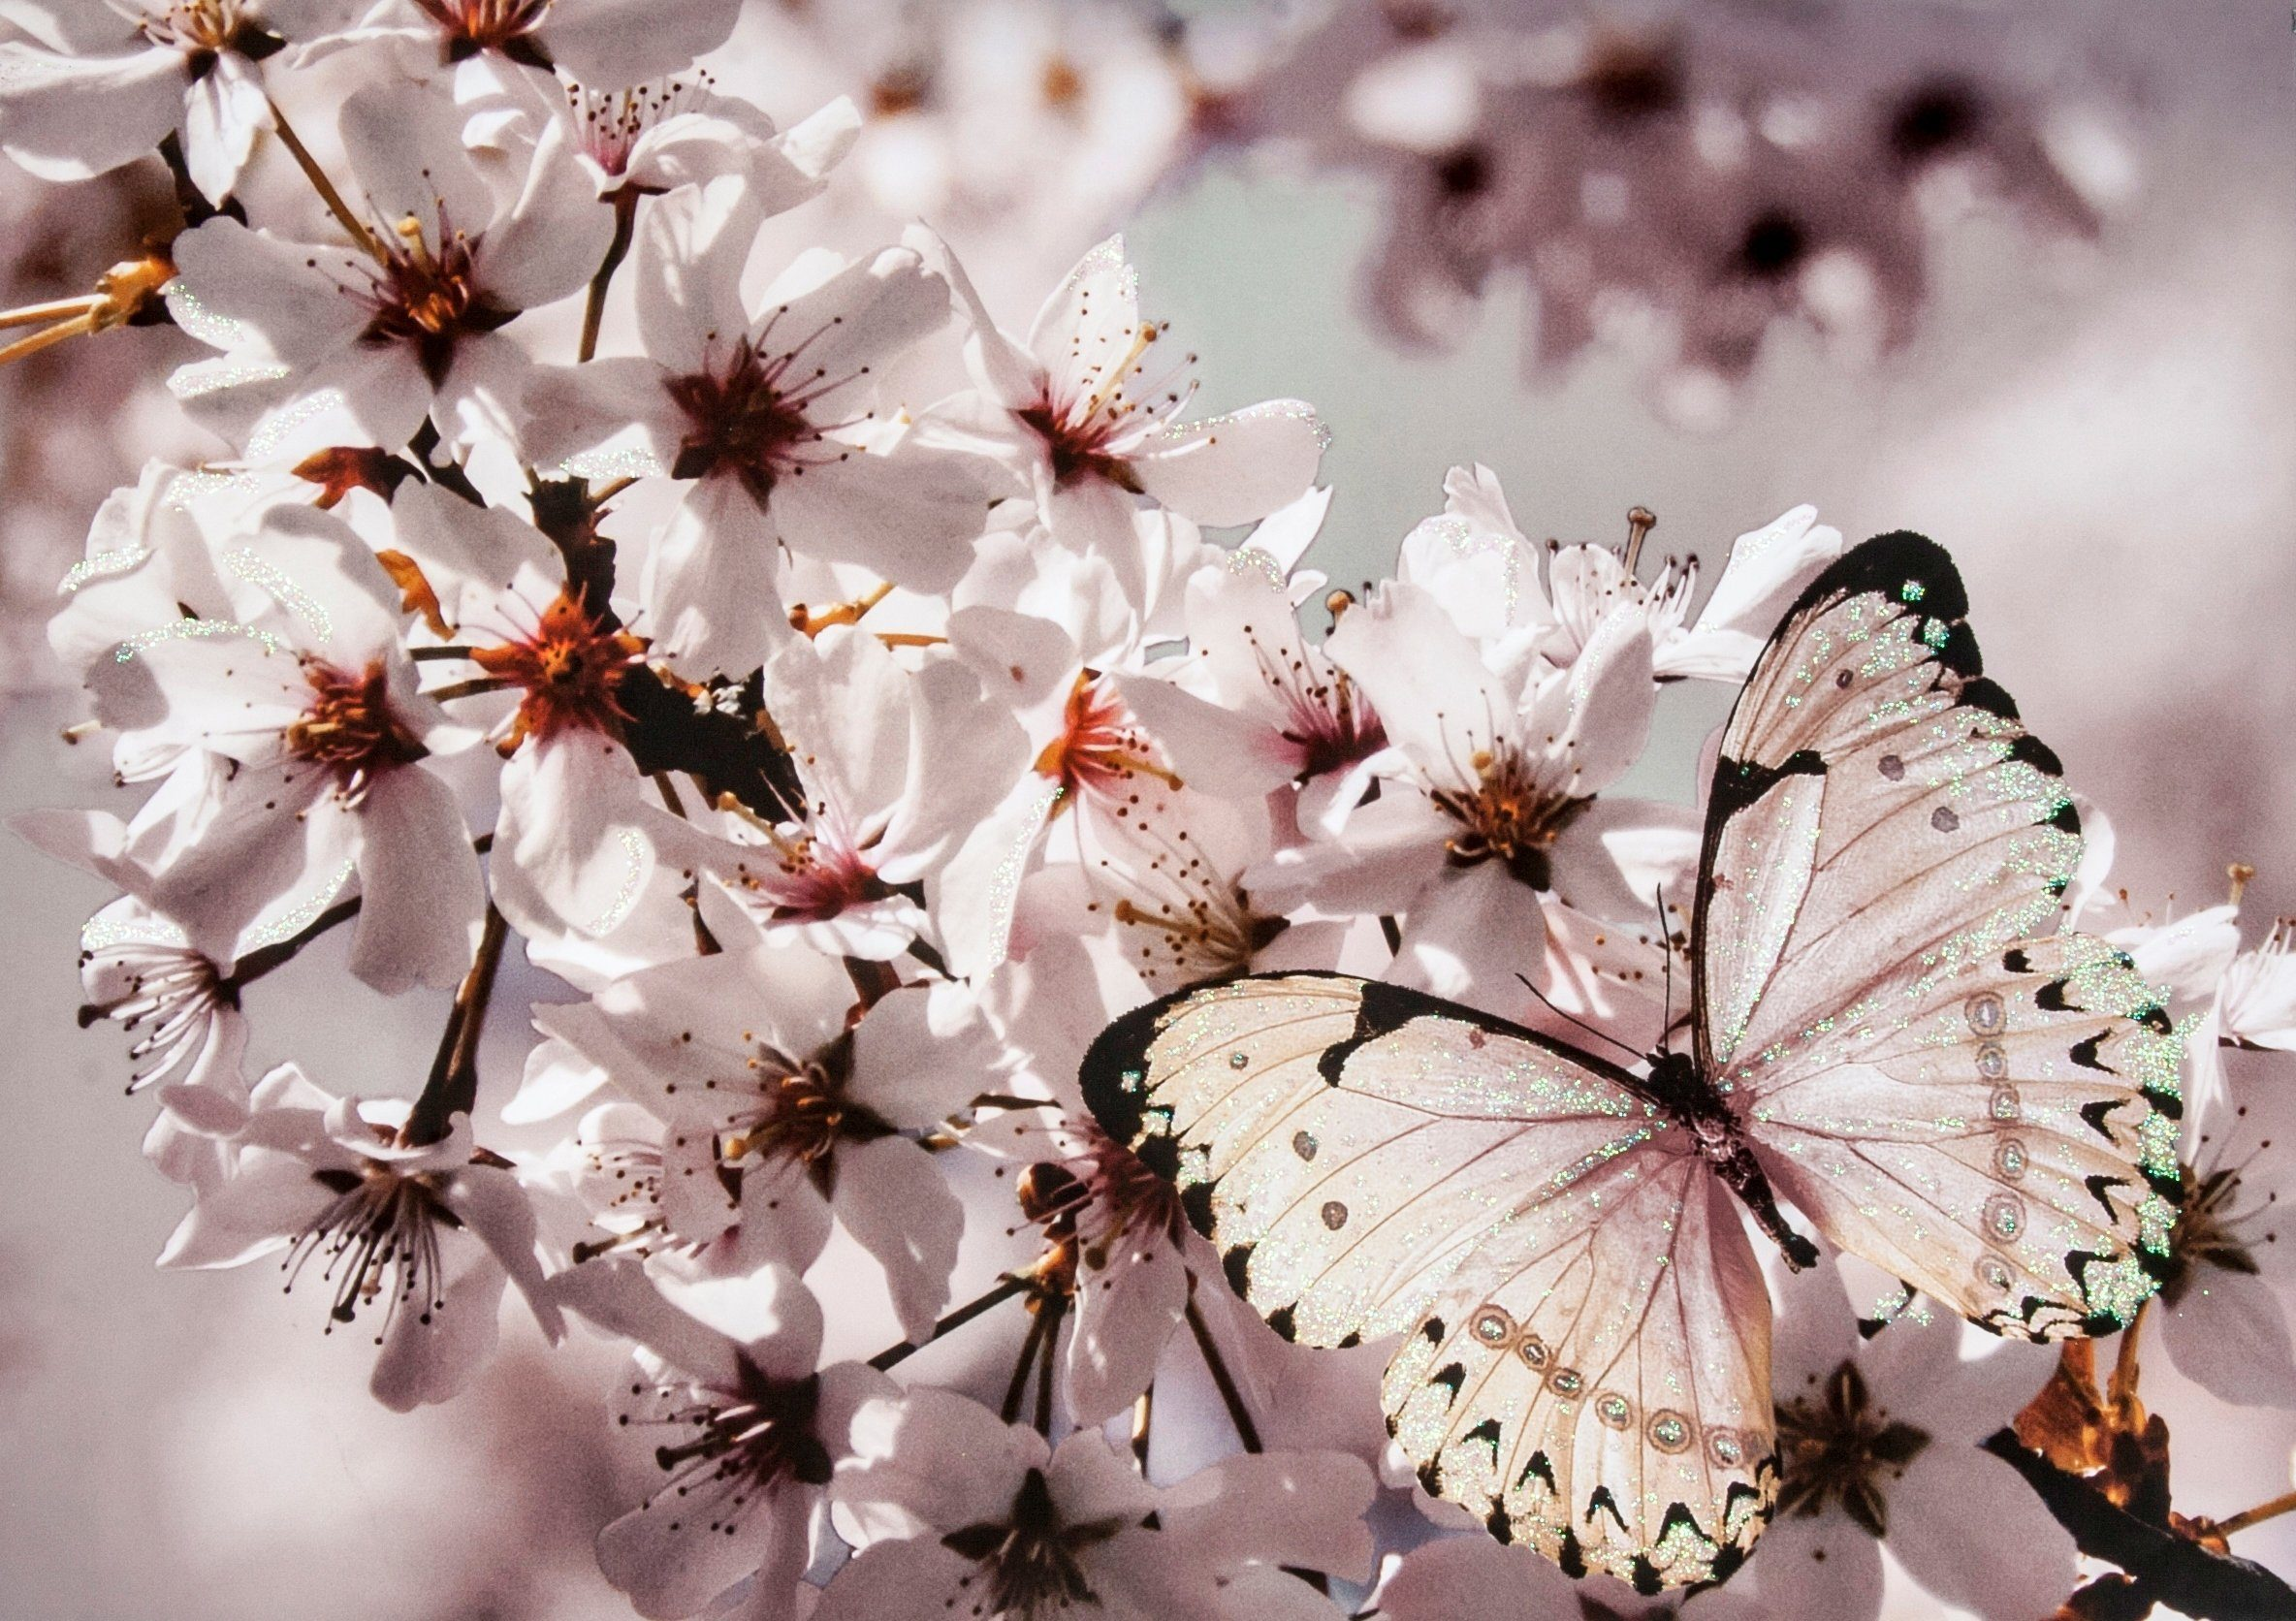 Leinwandbild »Schmetterling«, Glitzer